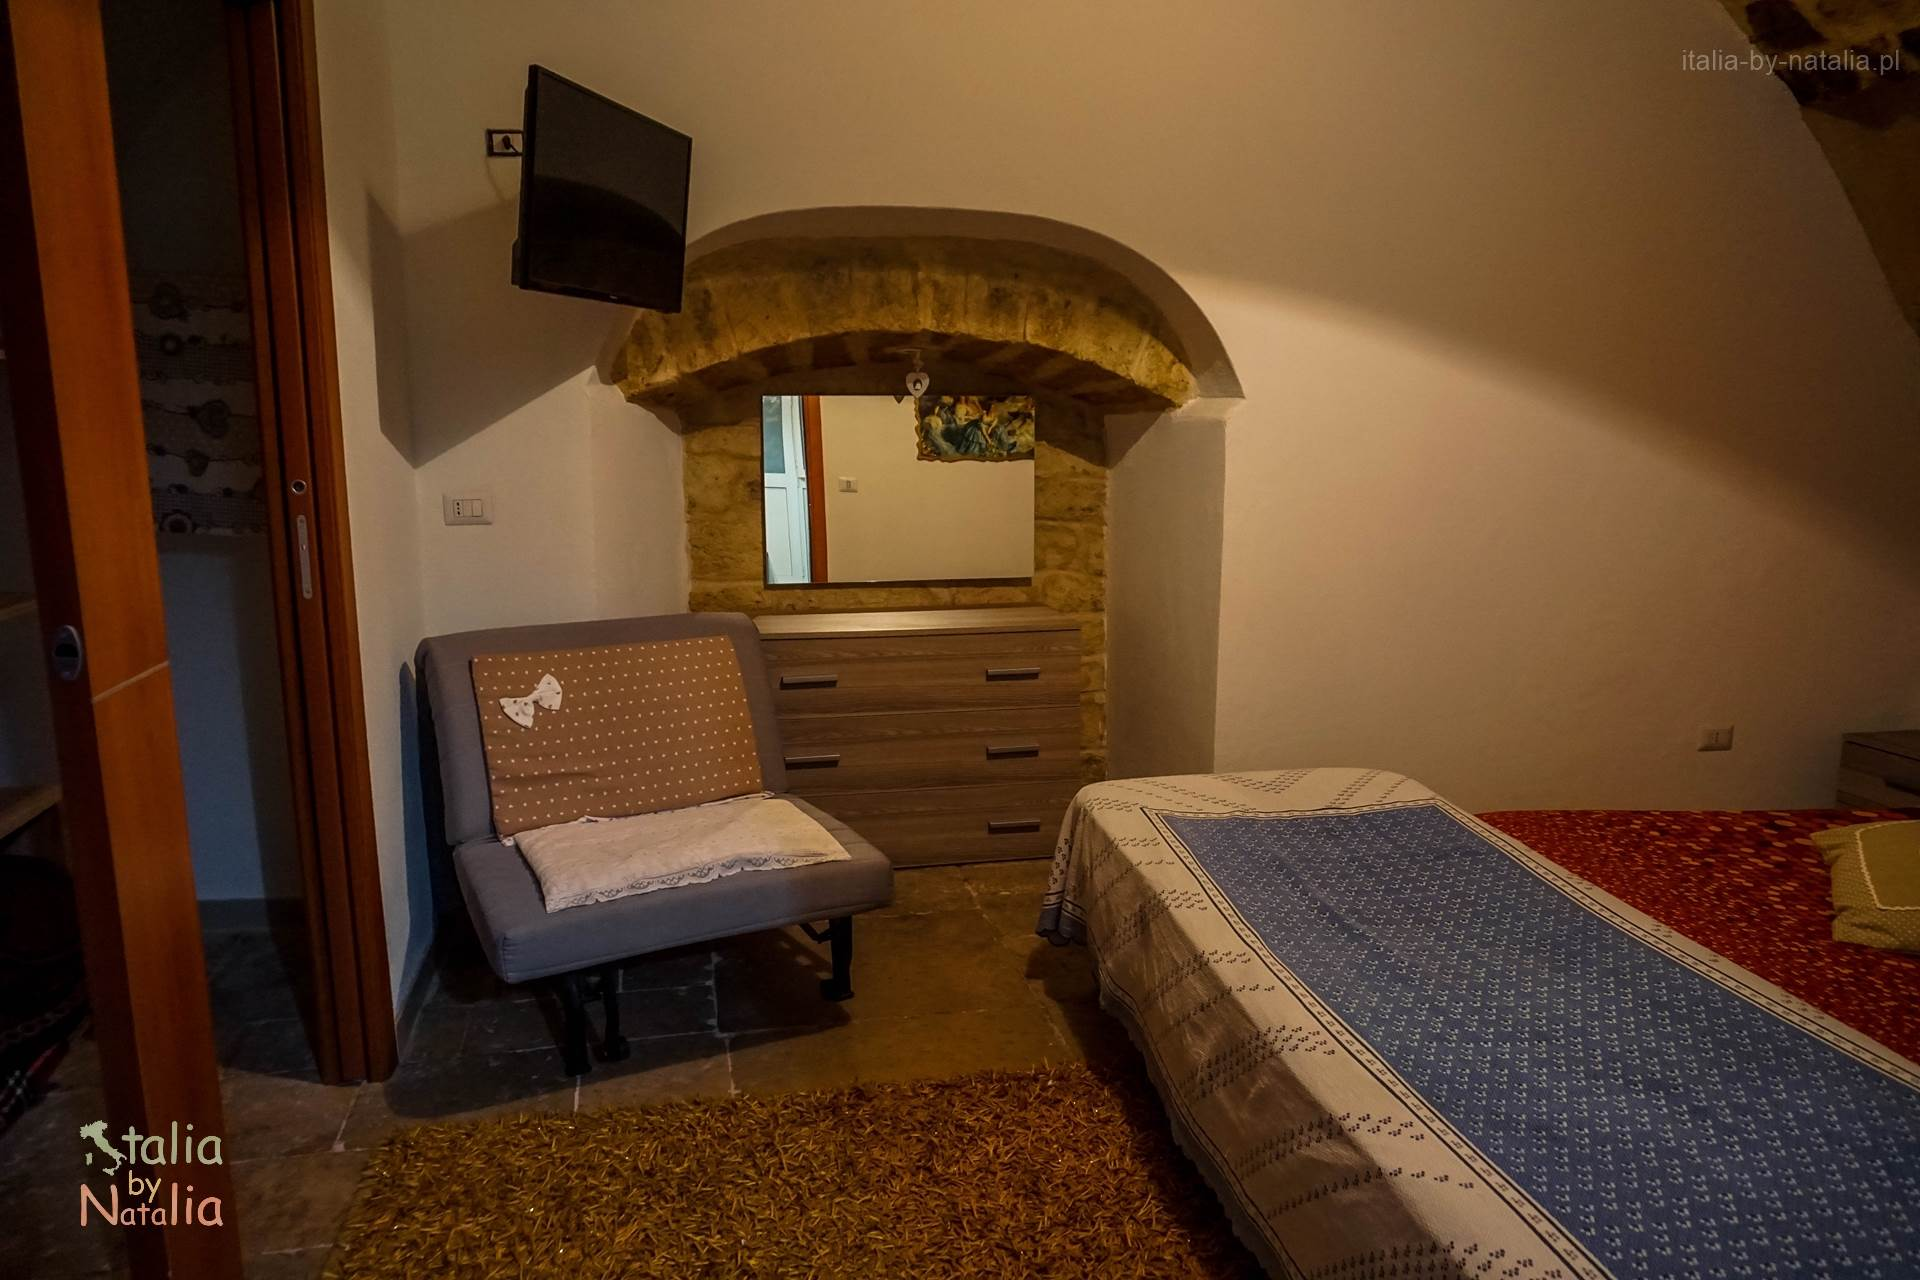 Bari apartament sprawdzony nocleg